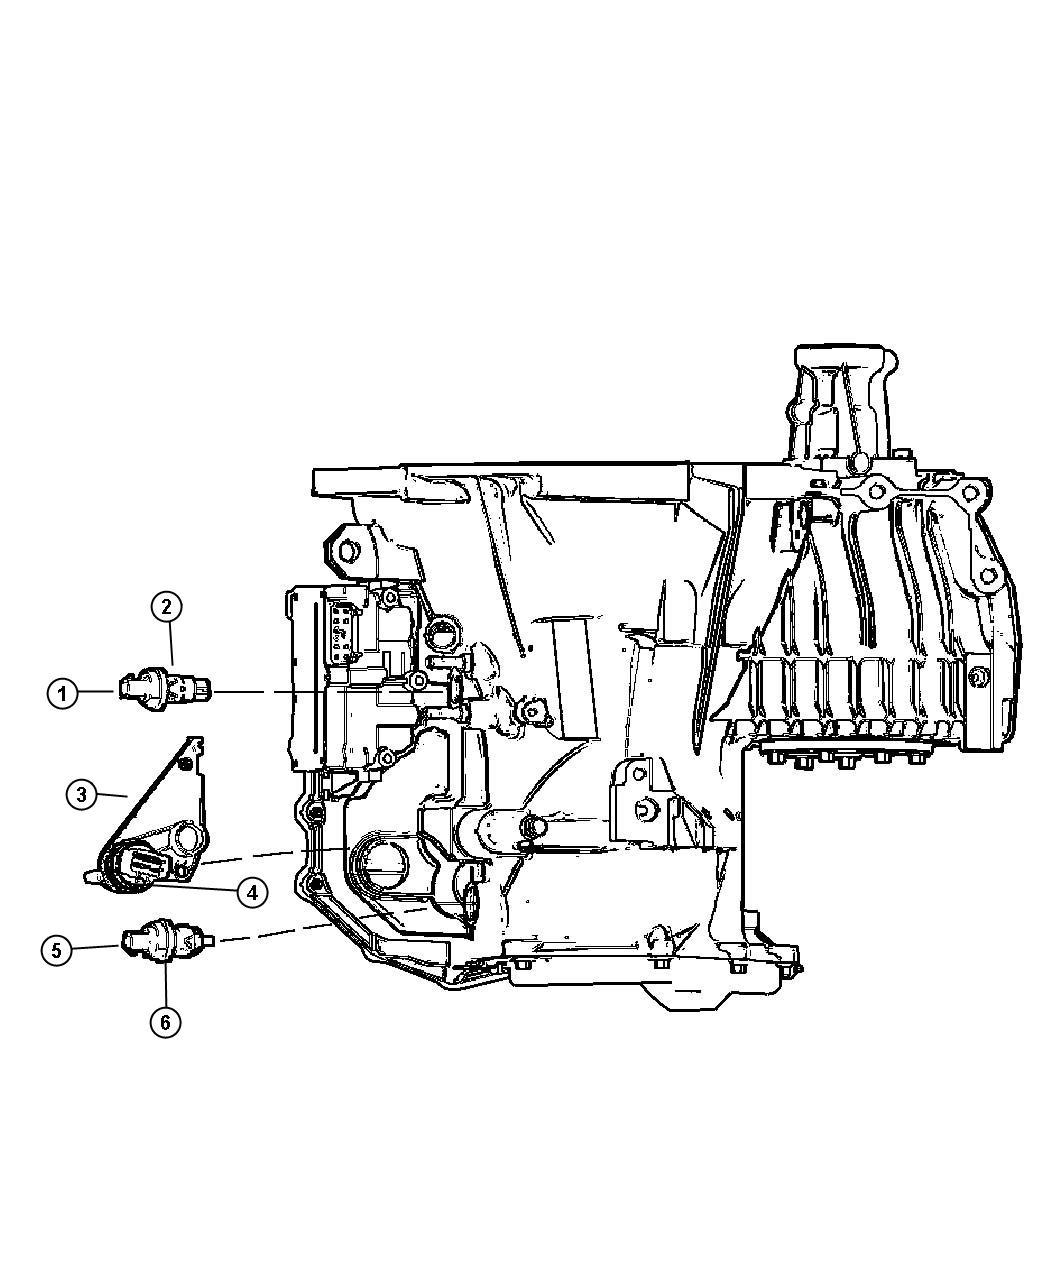 Chrysler Concorde Sensors, Transmission.